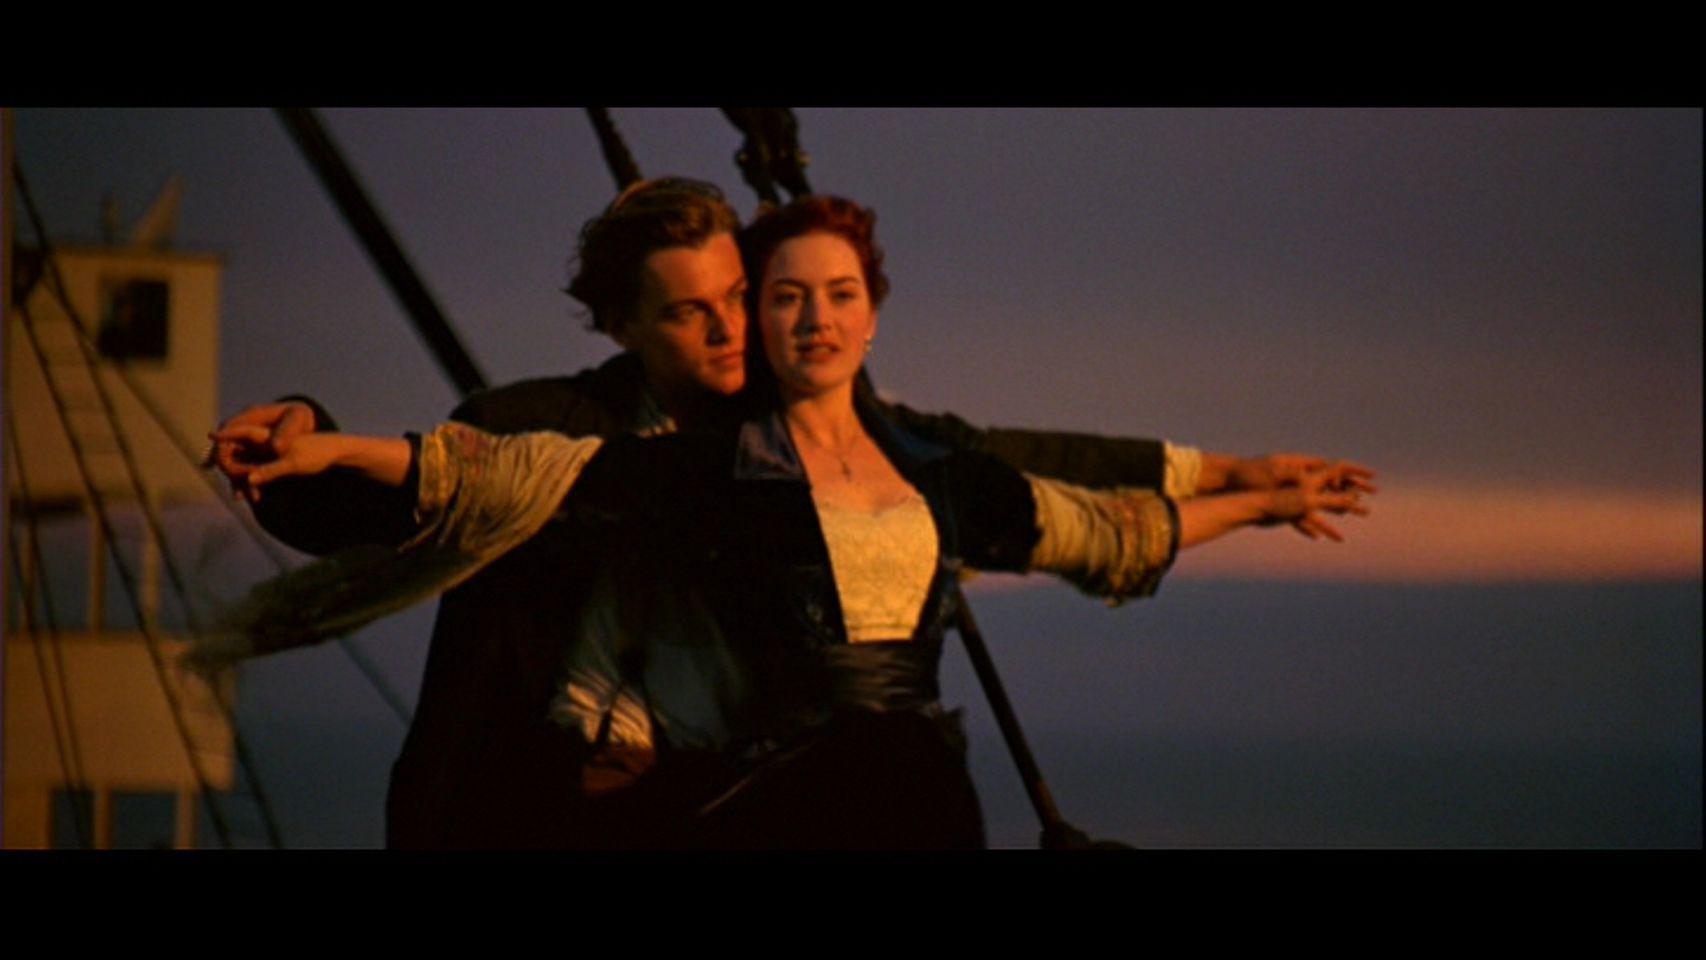 Titanic - Jack & Rose - Jack and Rose Image (22328000) - Fanpop